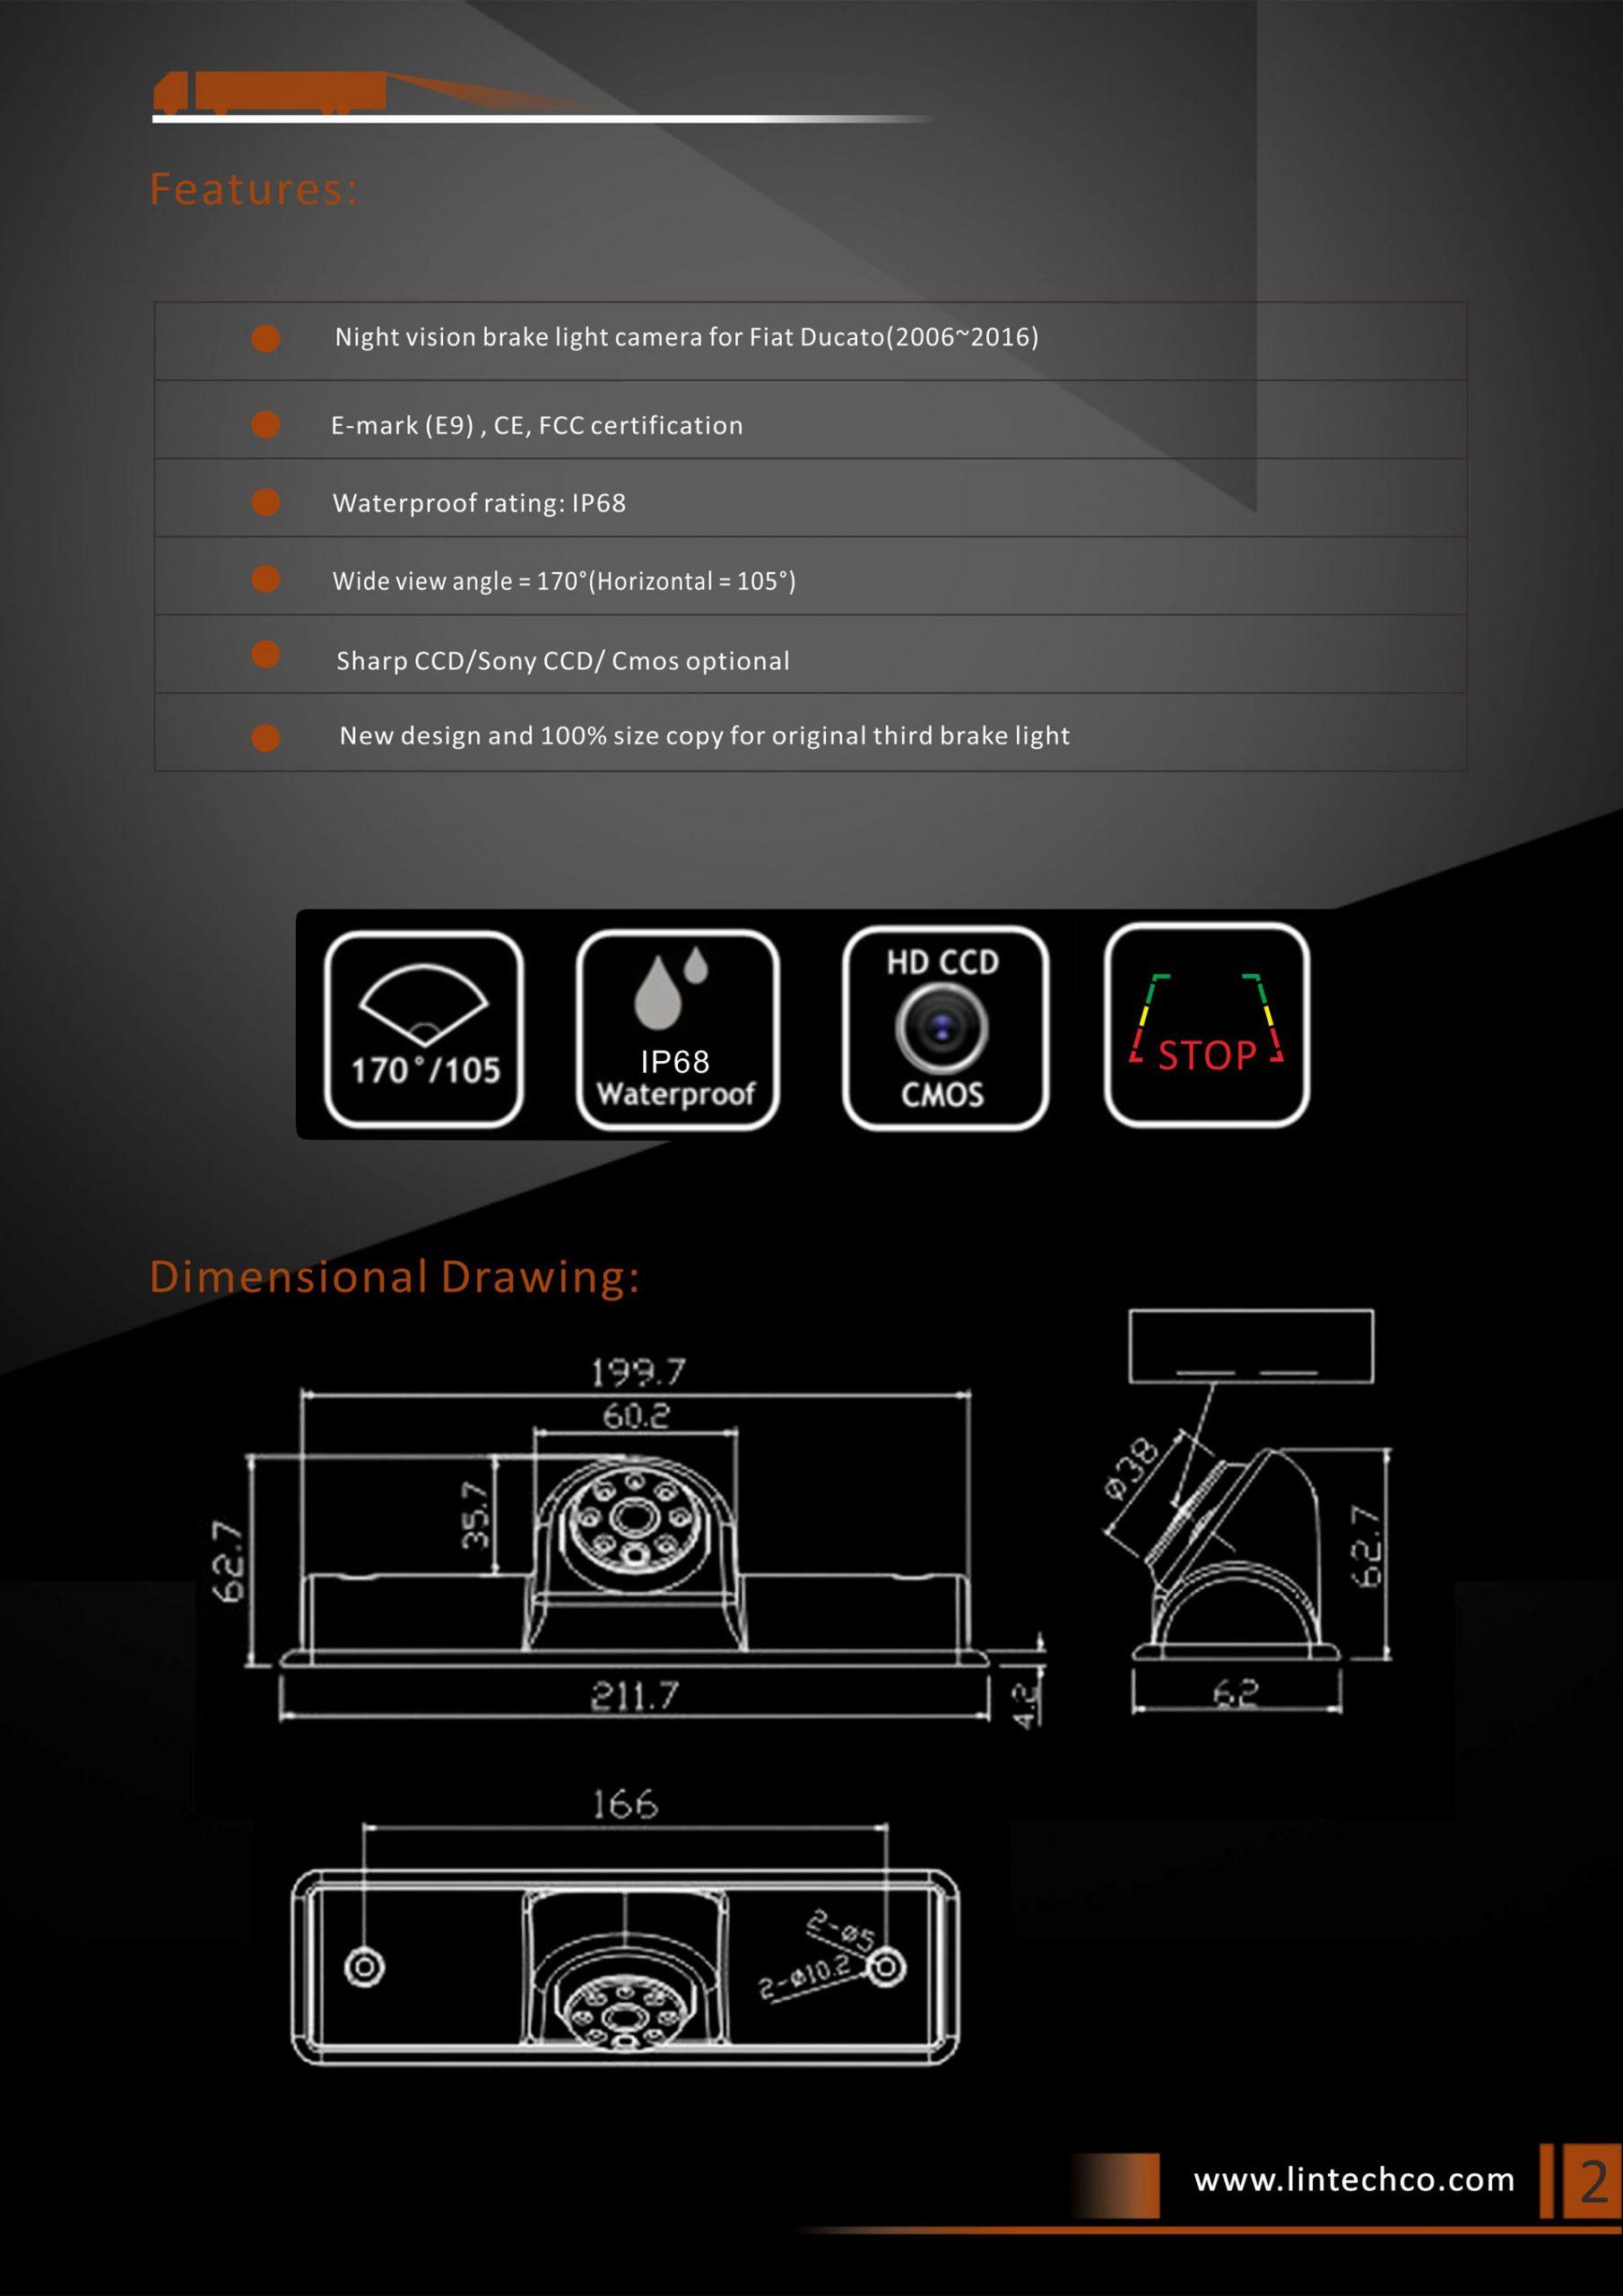 2.Night Vision Brake Light Camera for Universal Vans